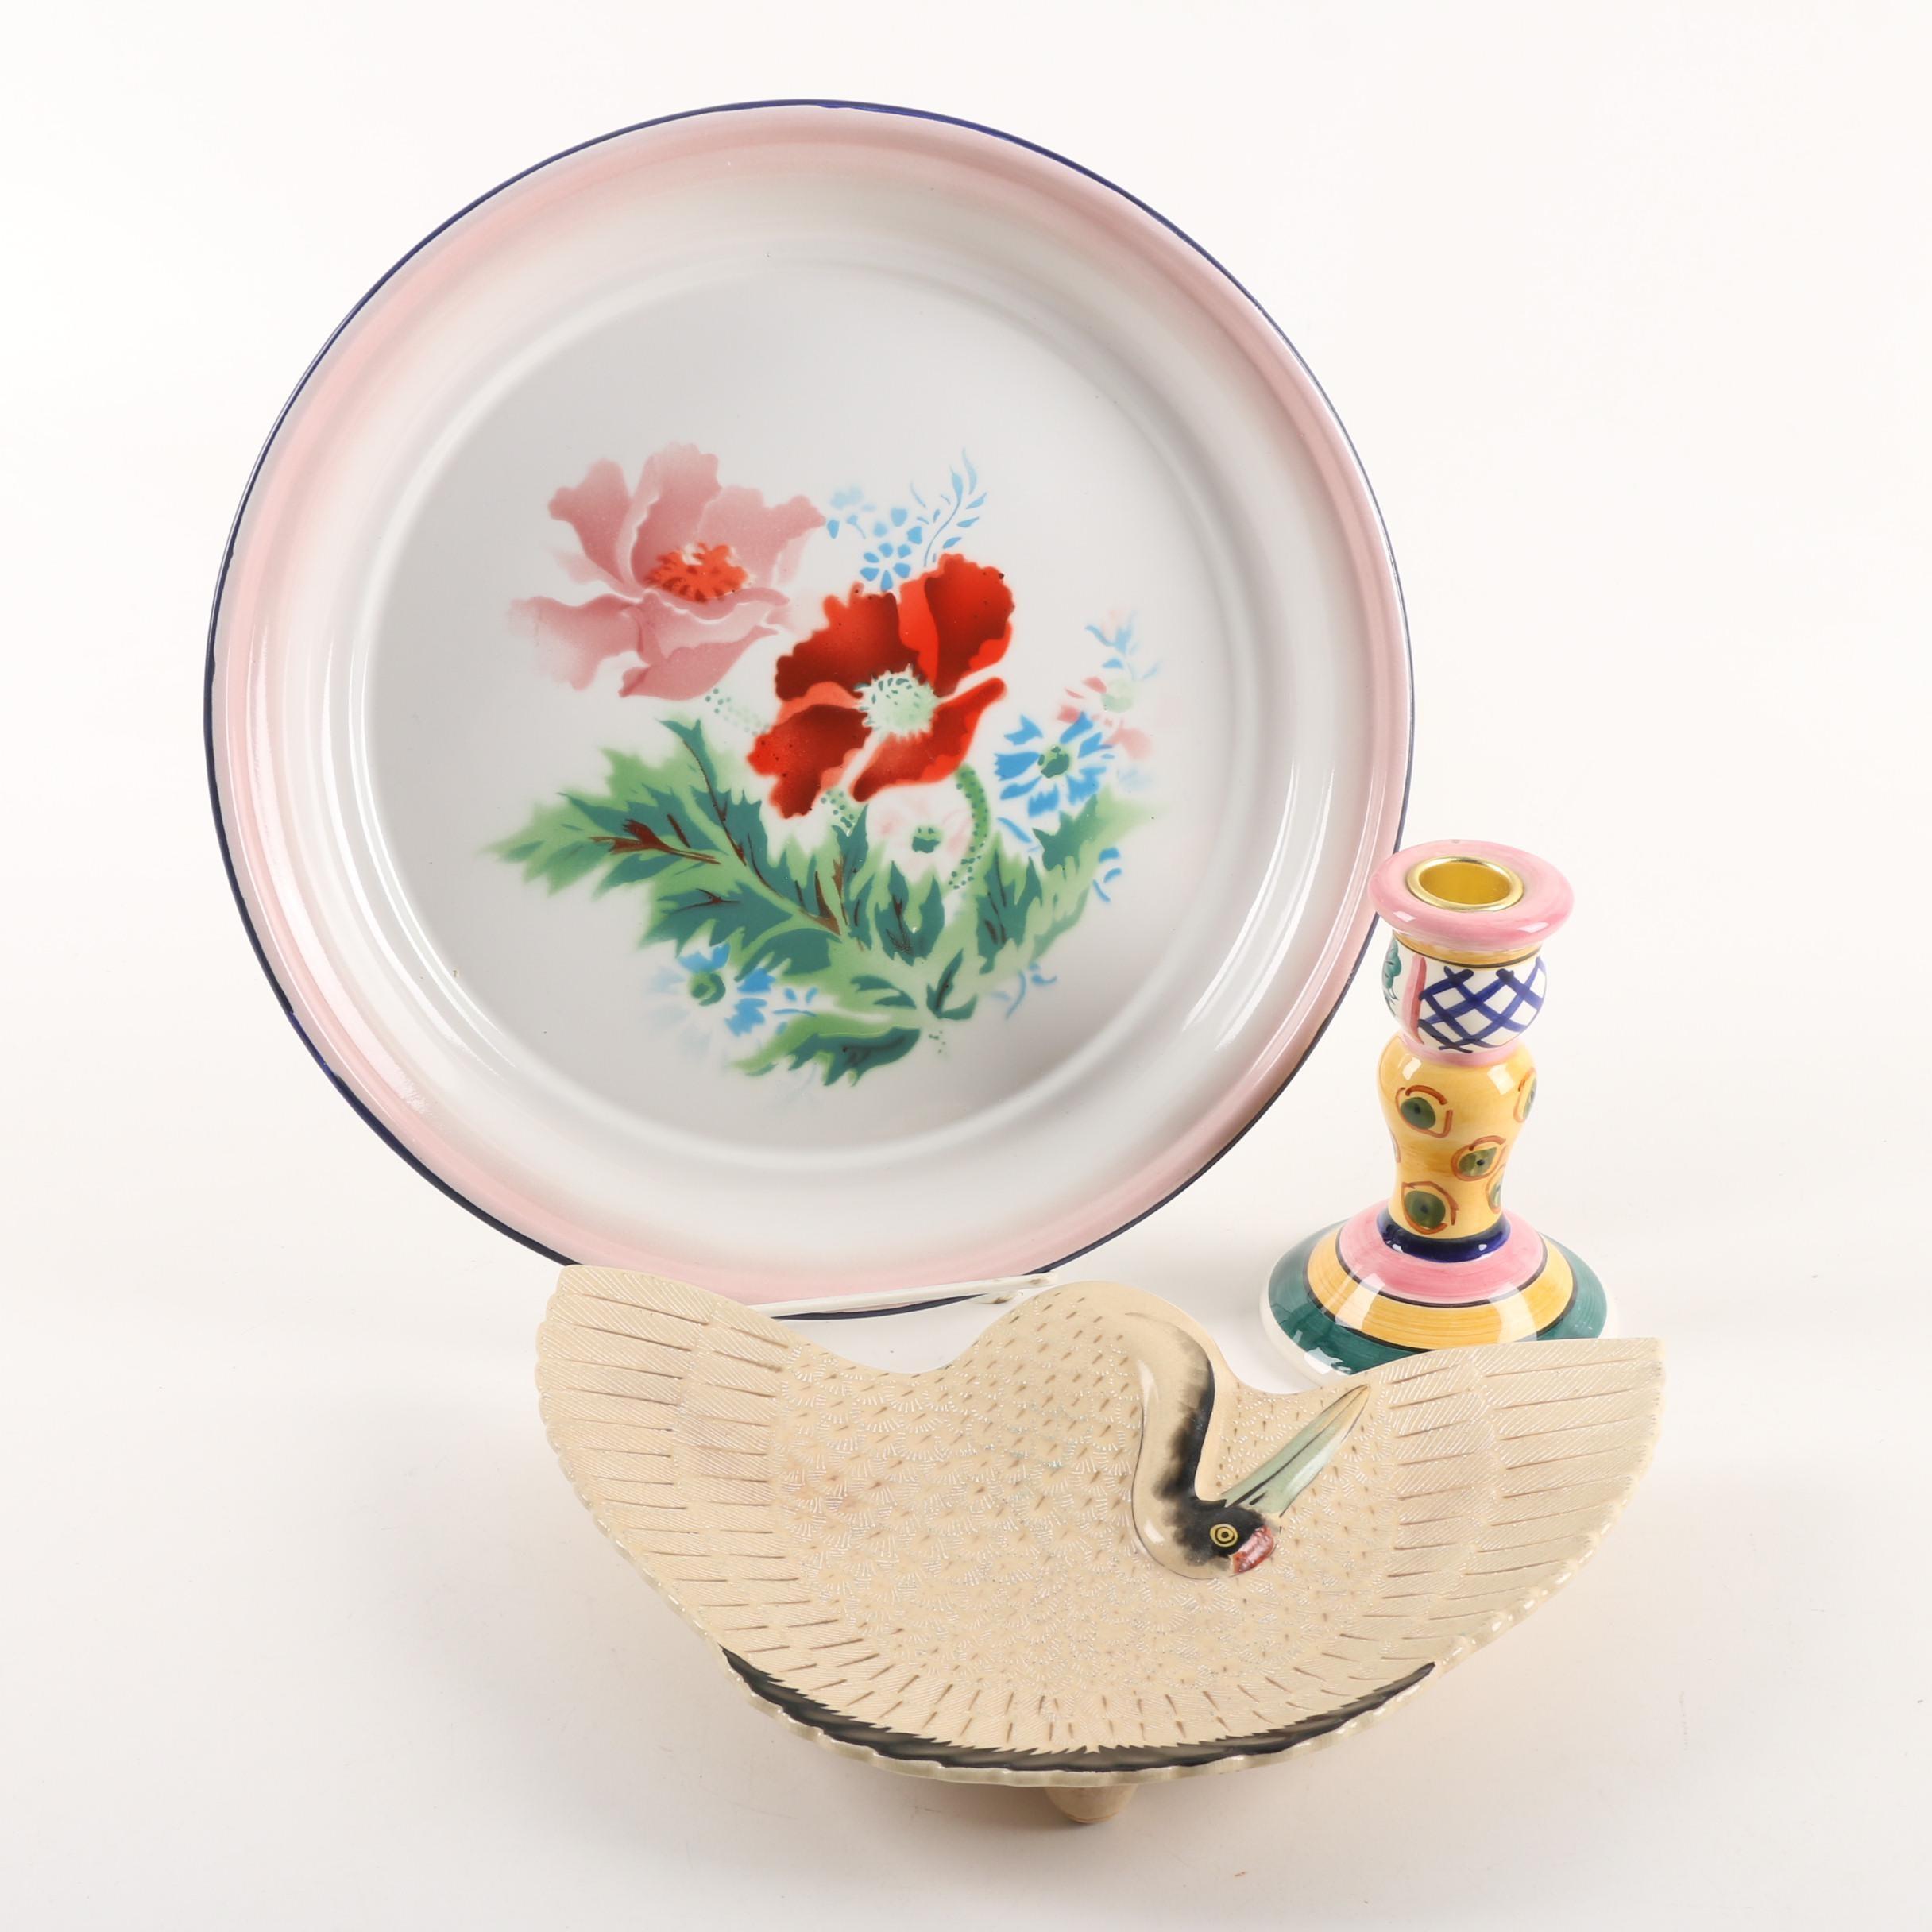 Vintage Red Crested Crane Ceramic Dish and Bumper Harvest Enamel Tray